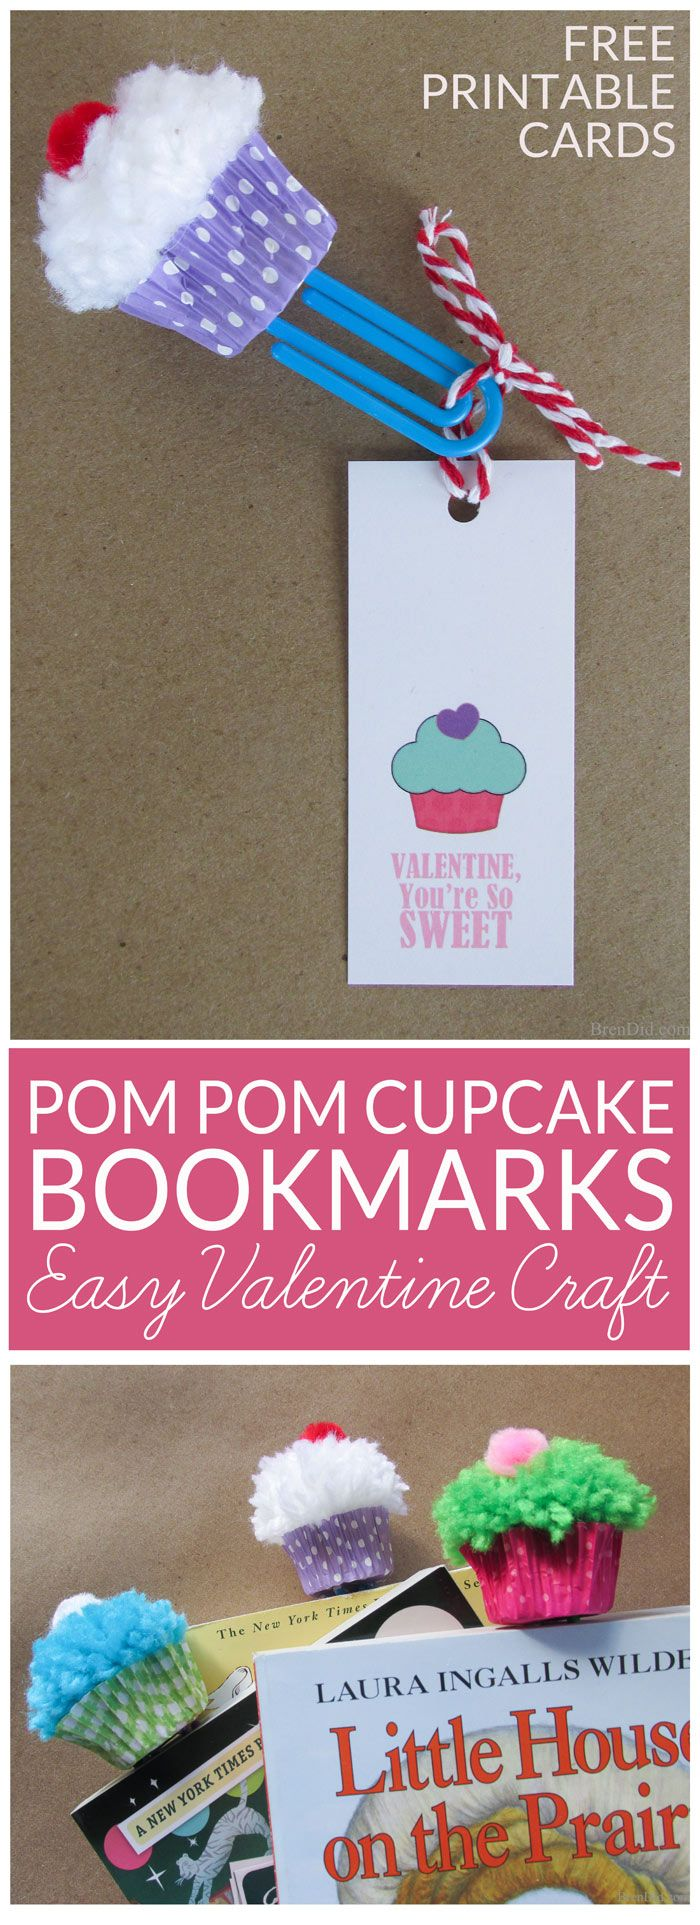 Cupcake Bookmark Craft Free Printable Valentine Cards – Cupcake Valentine Card